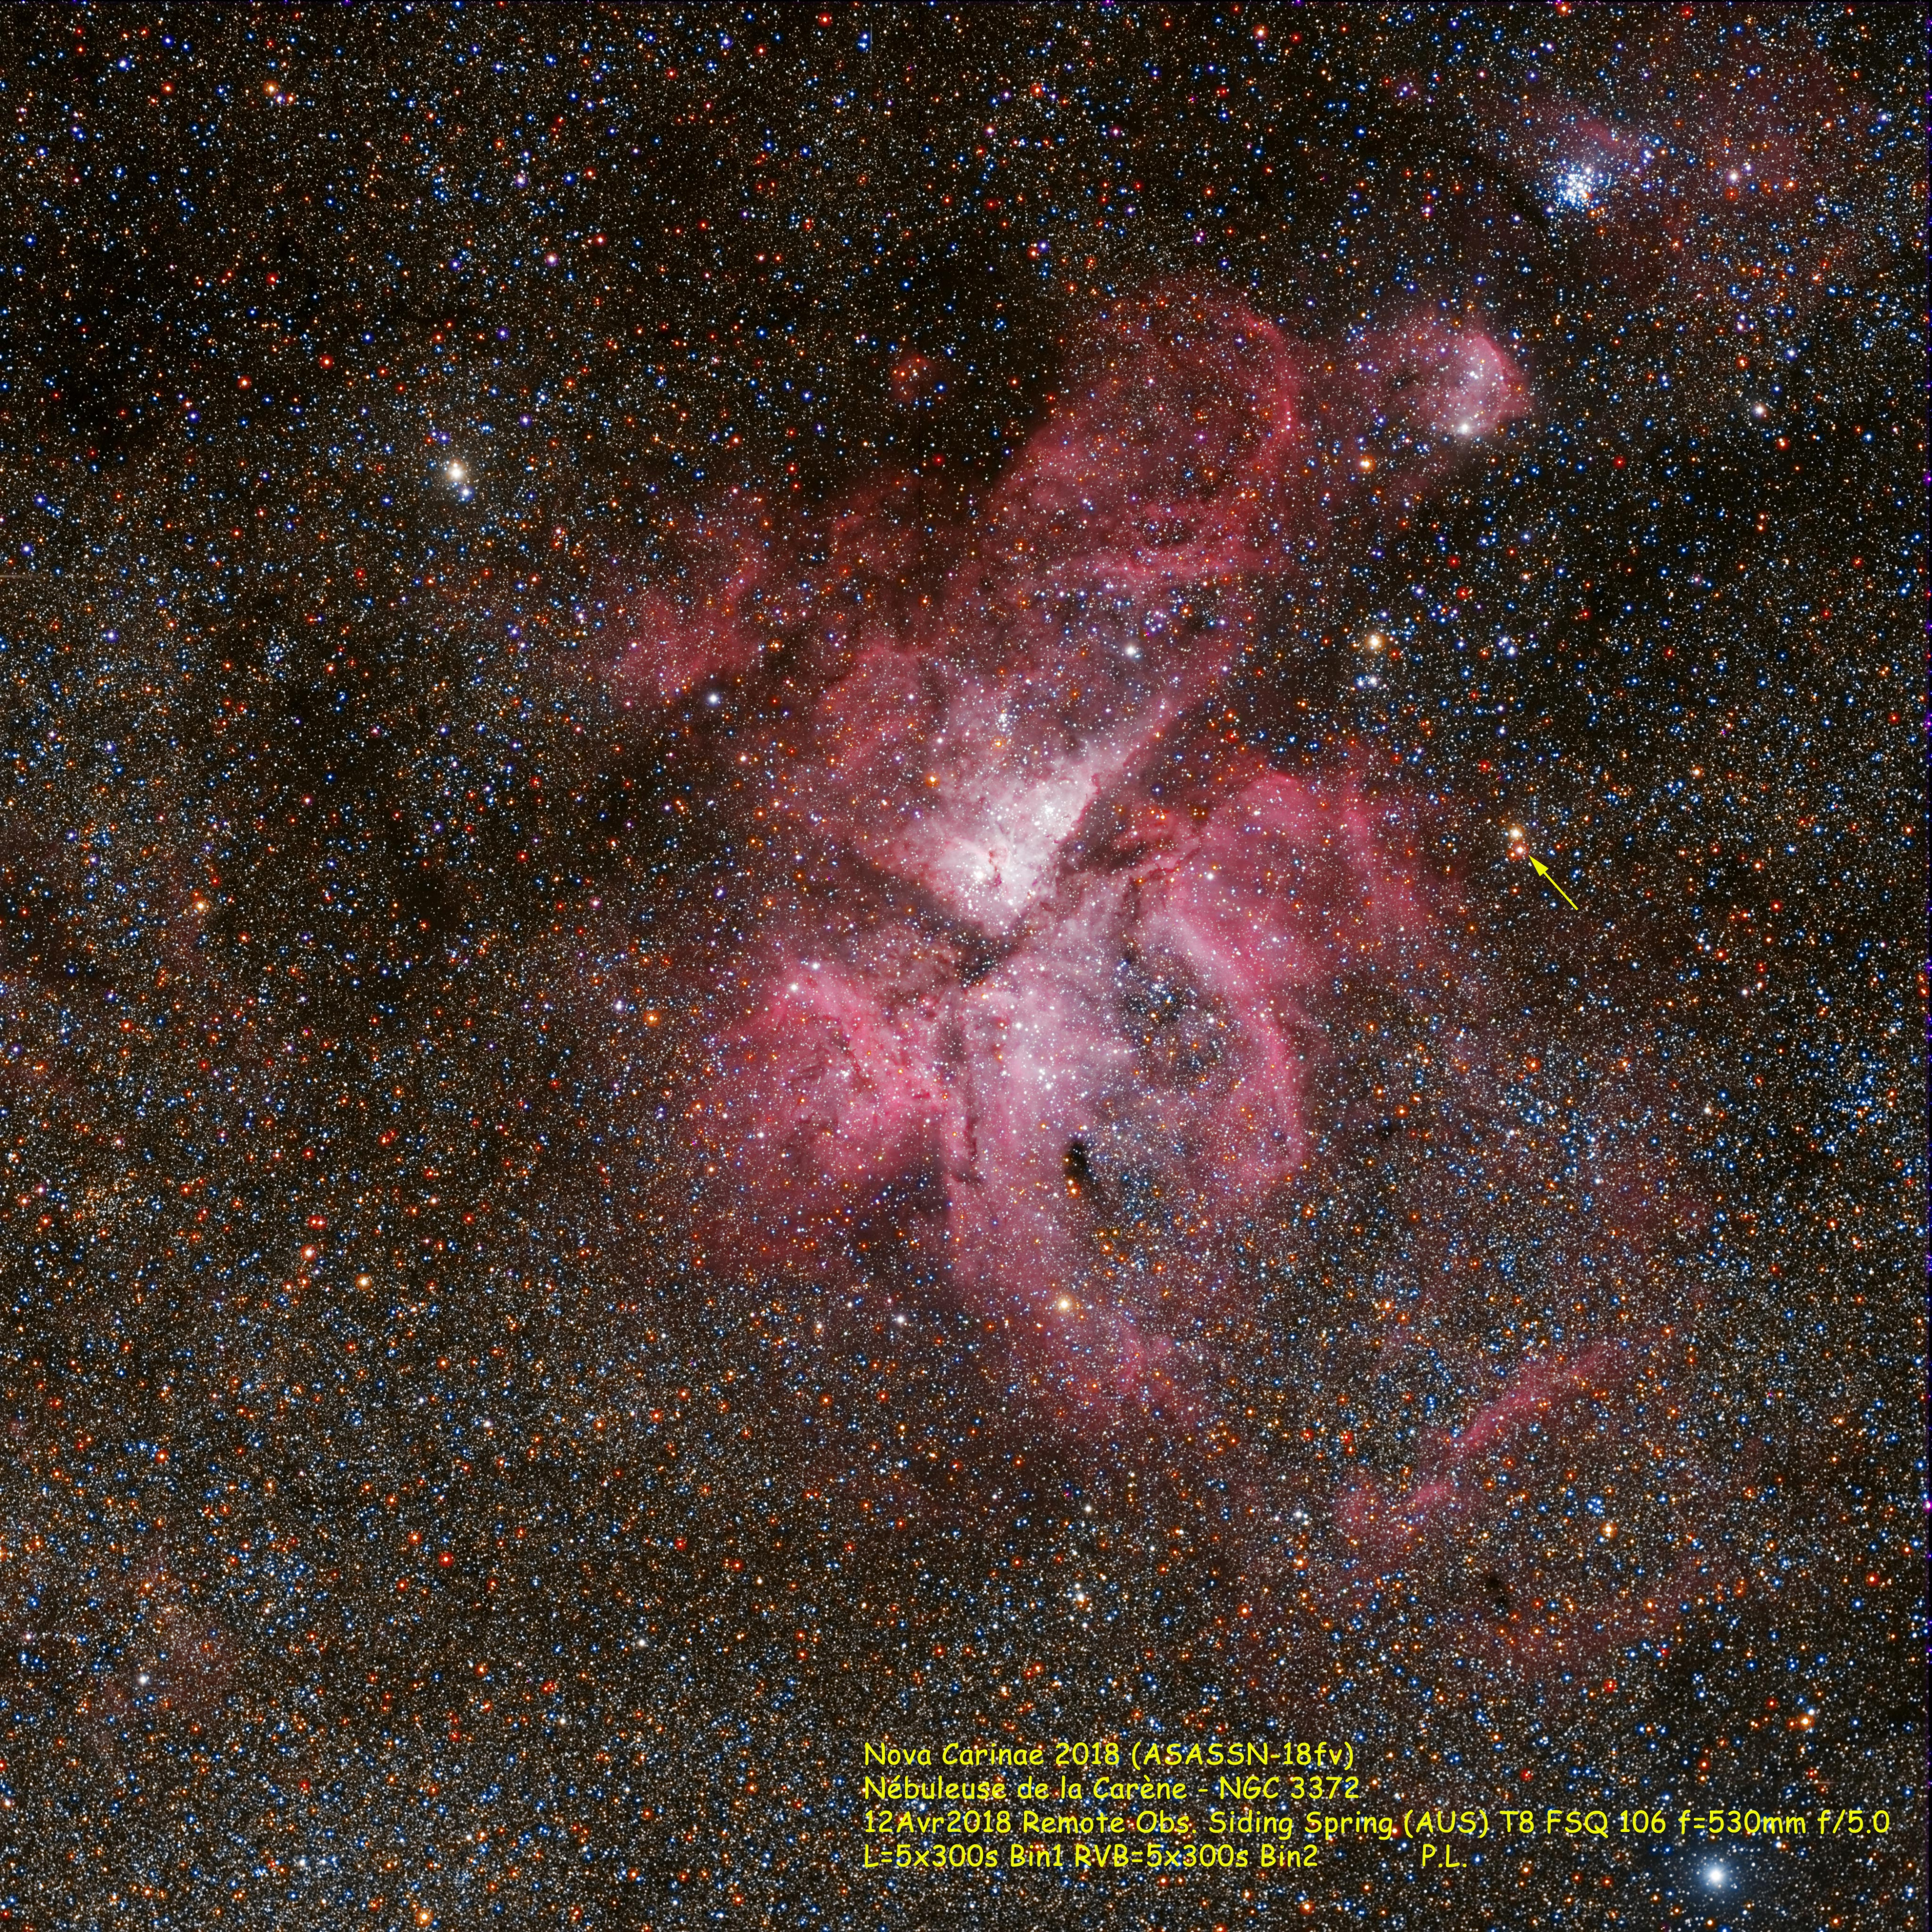 NGC3372_Nova_txt.jpg